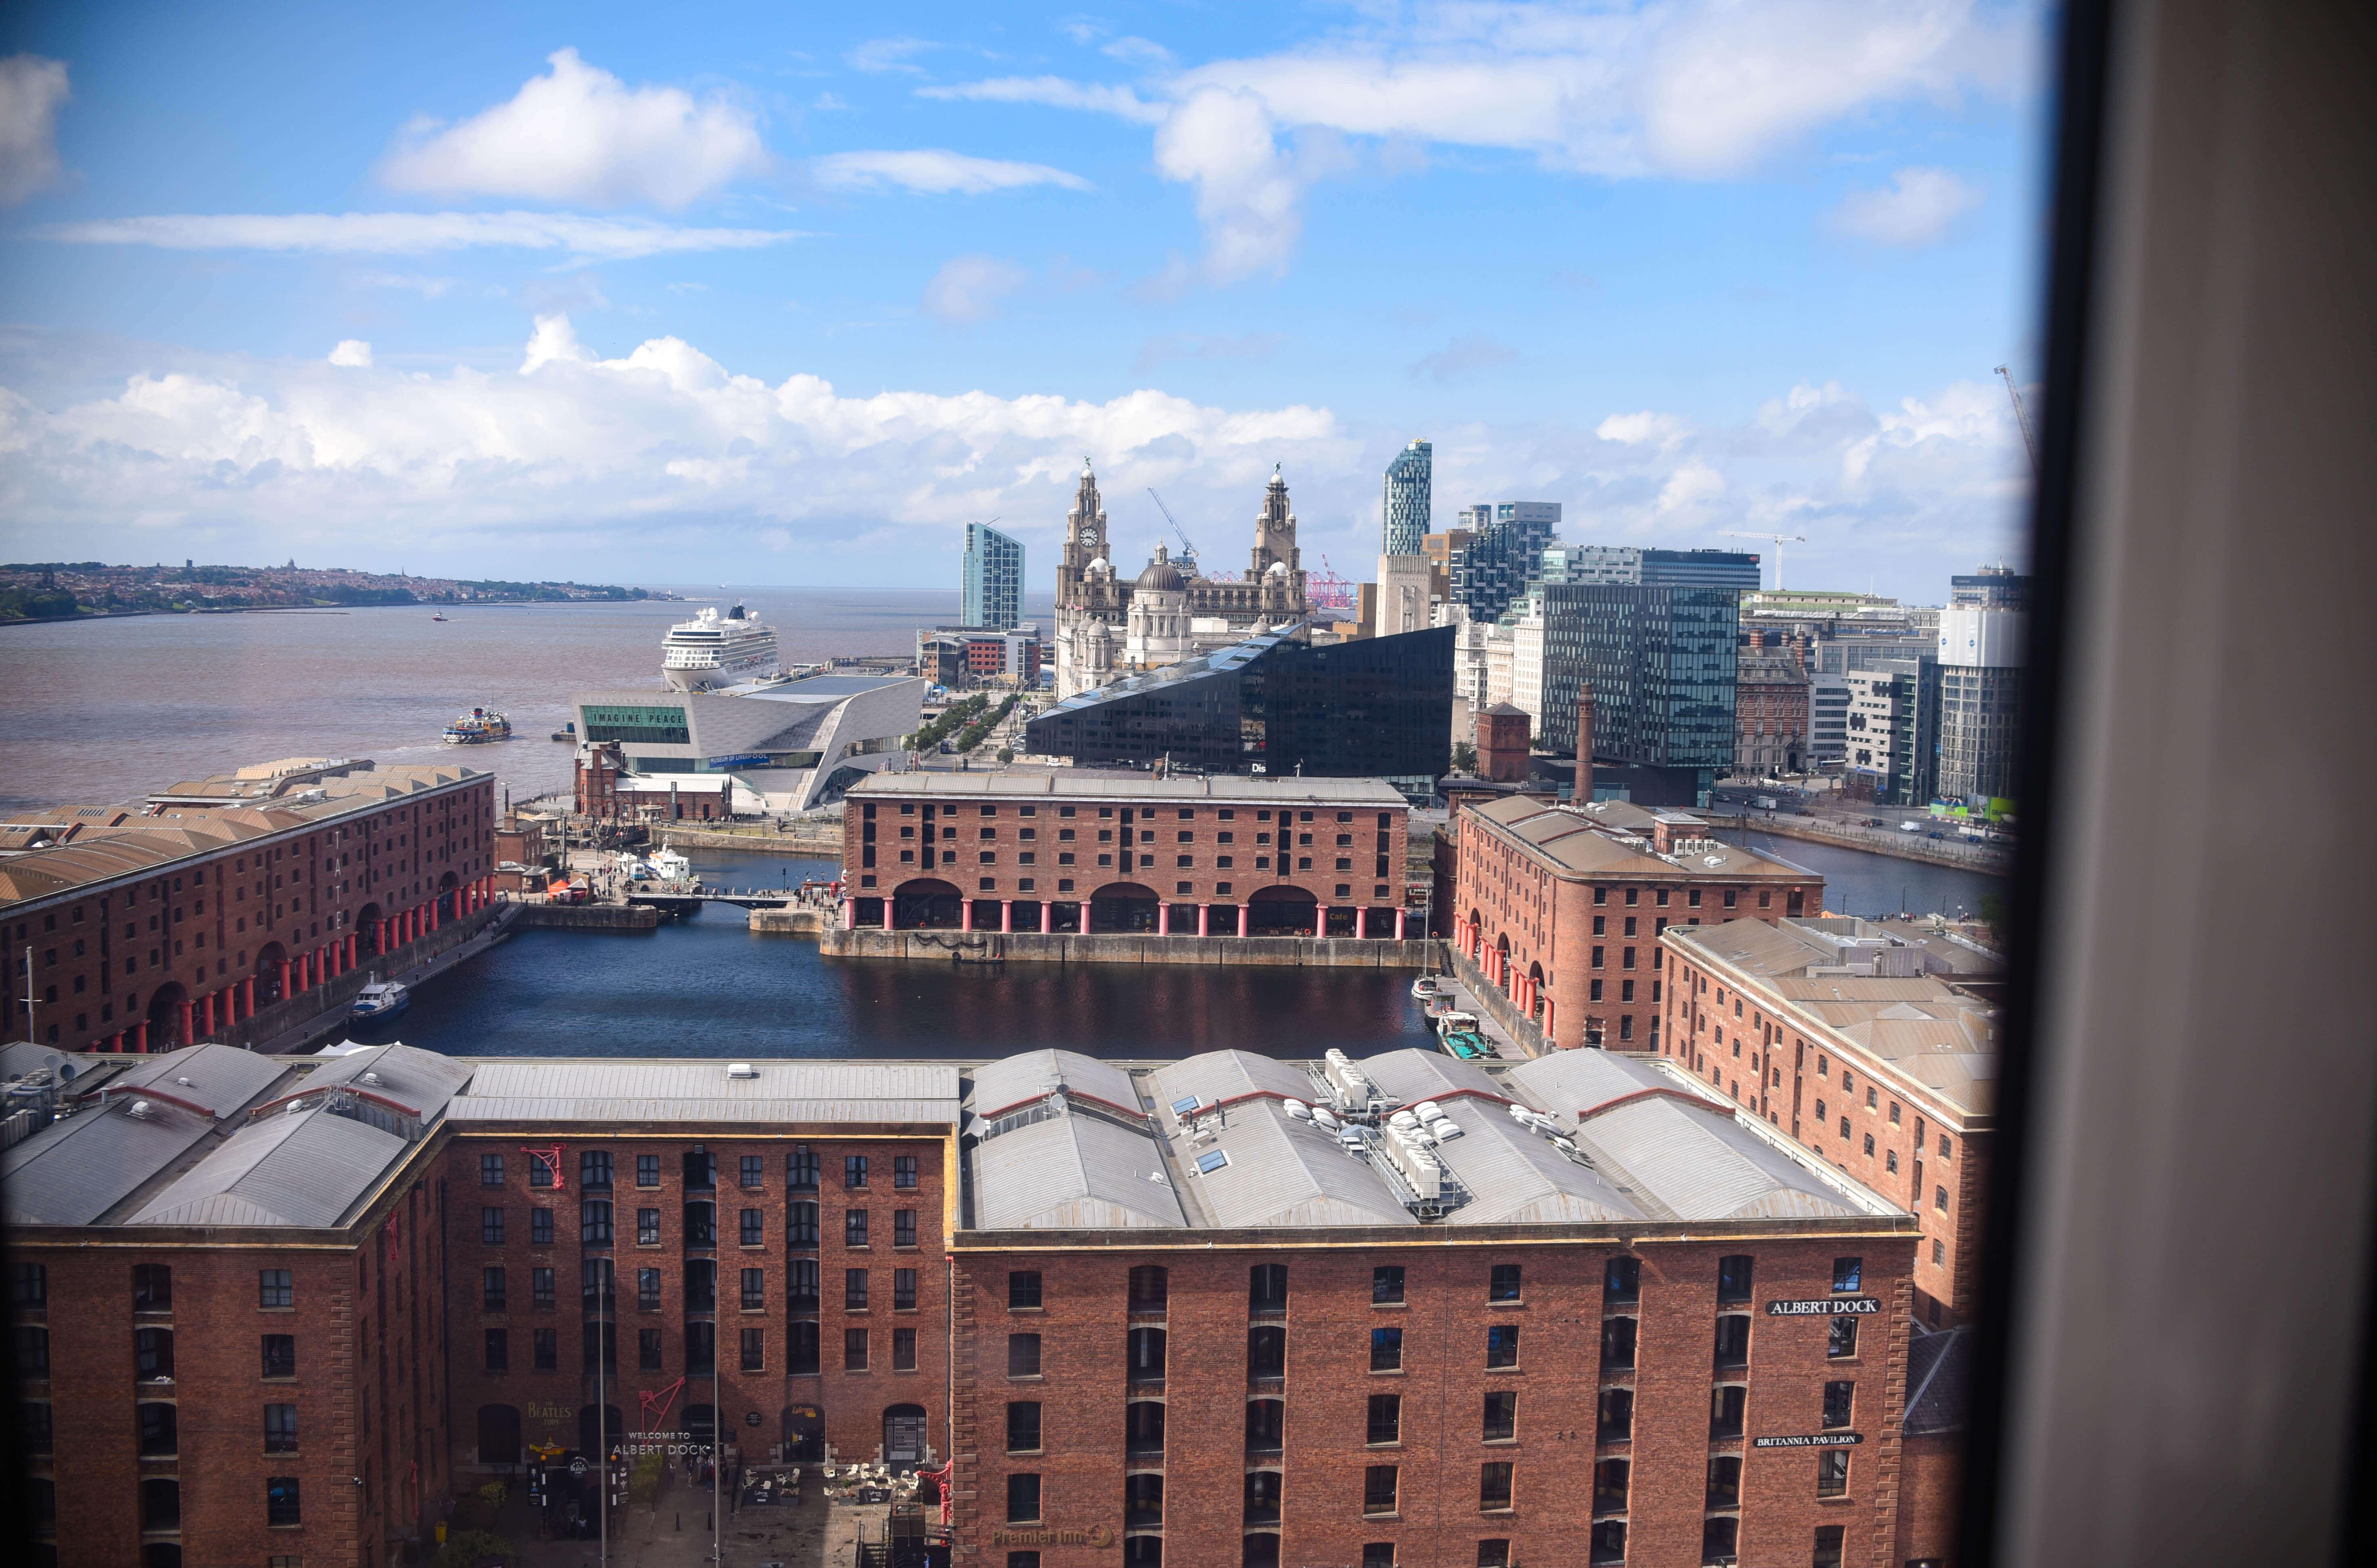 Liverpool Wheel Views